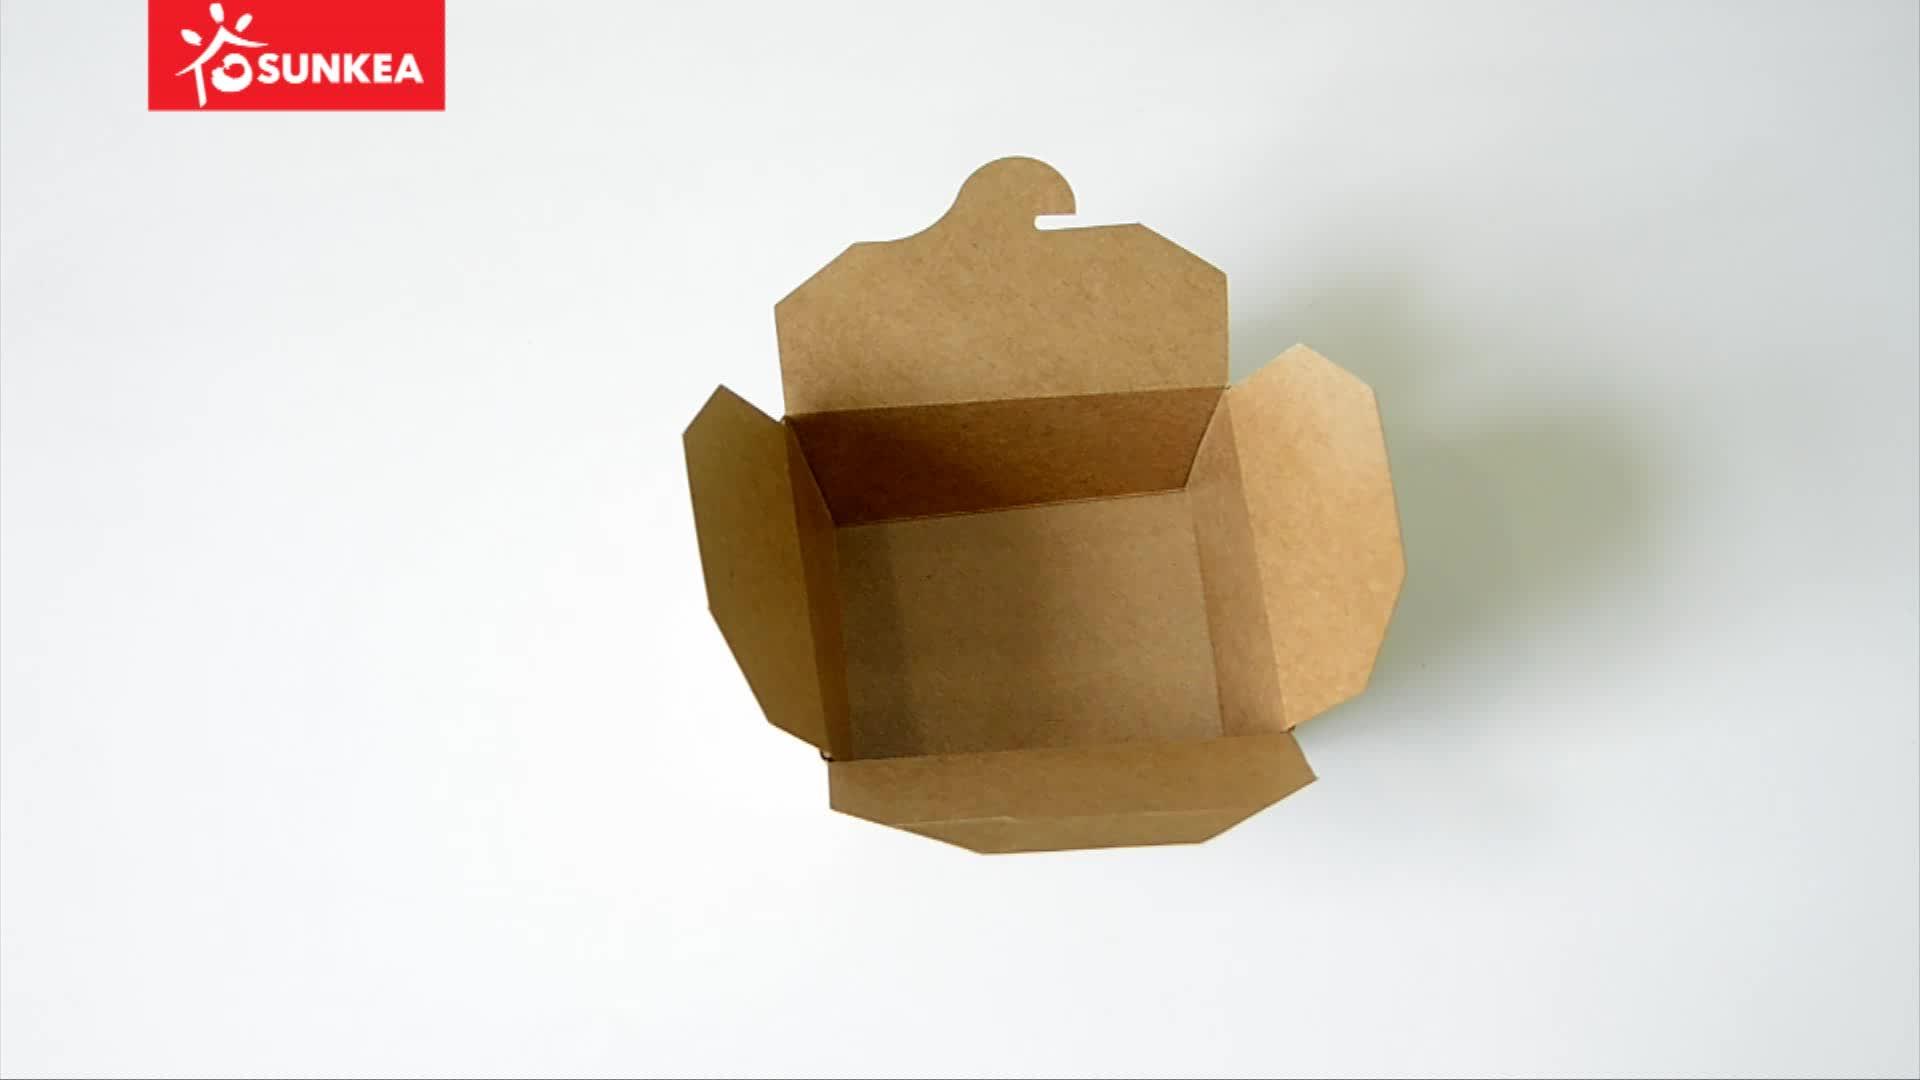 Одноразовые вынос биоразлагаемая печатная бумага фаст-фуд упаковка